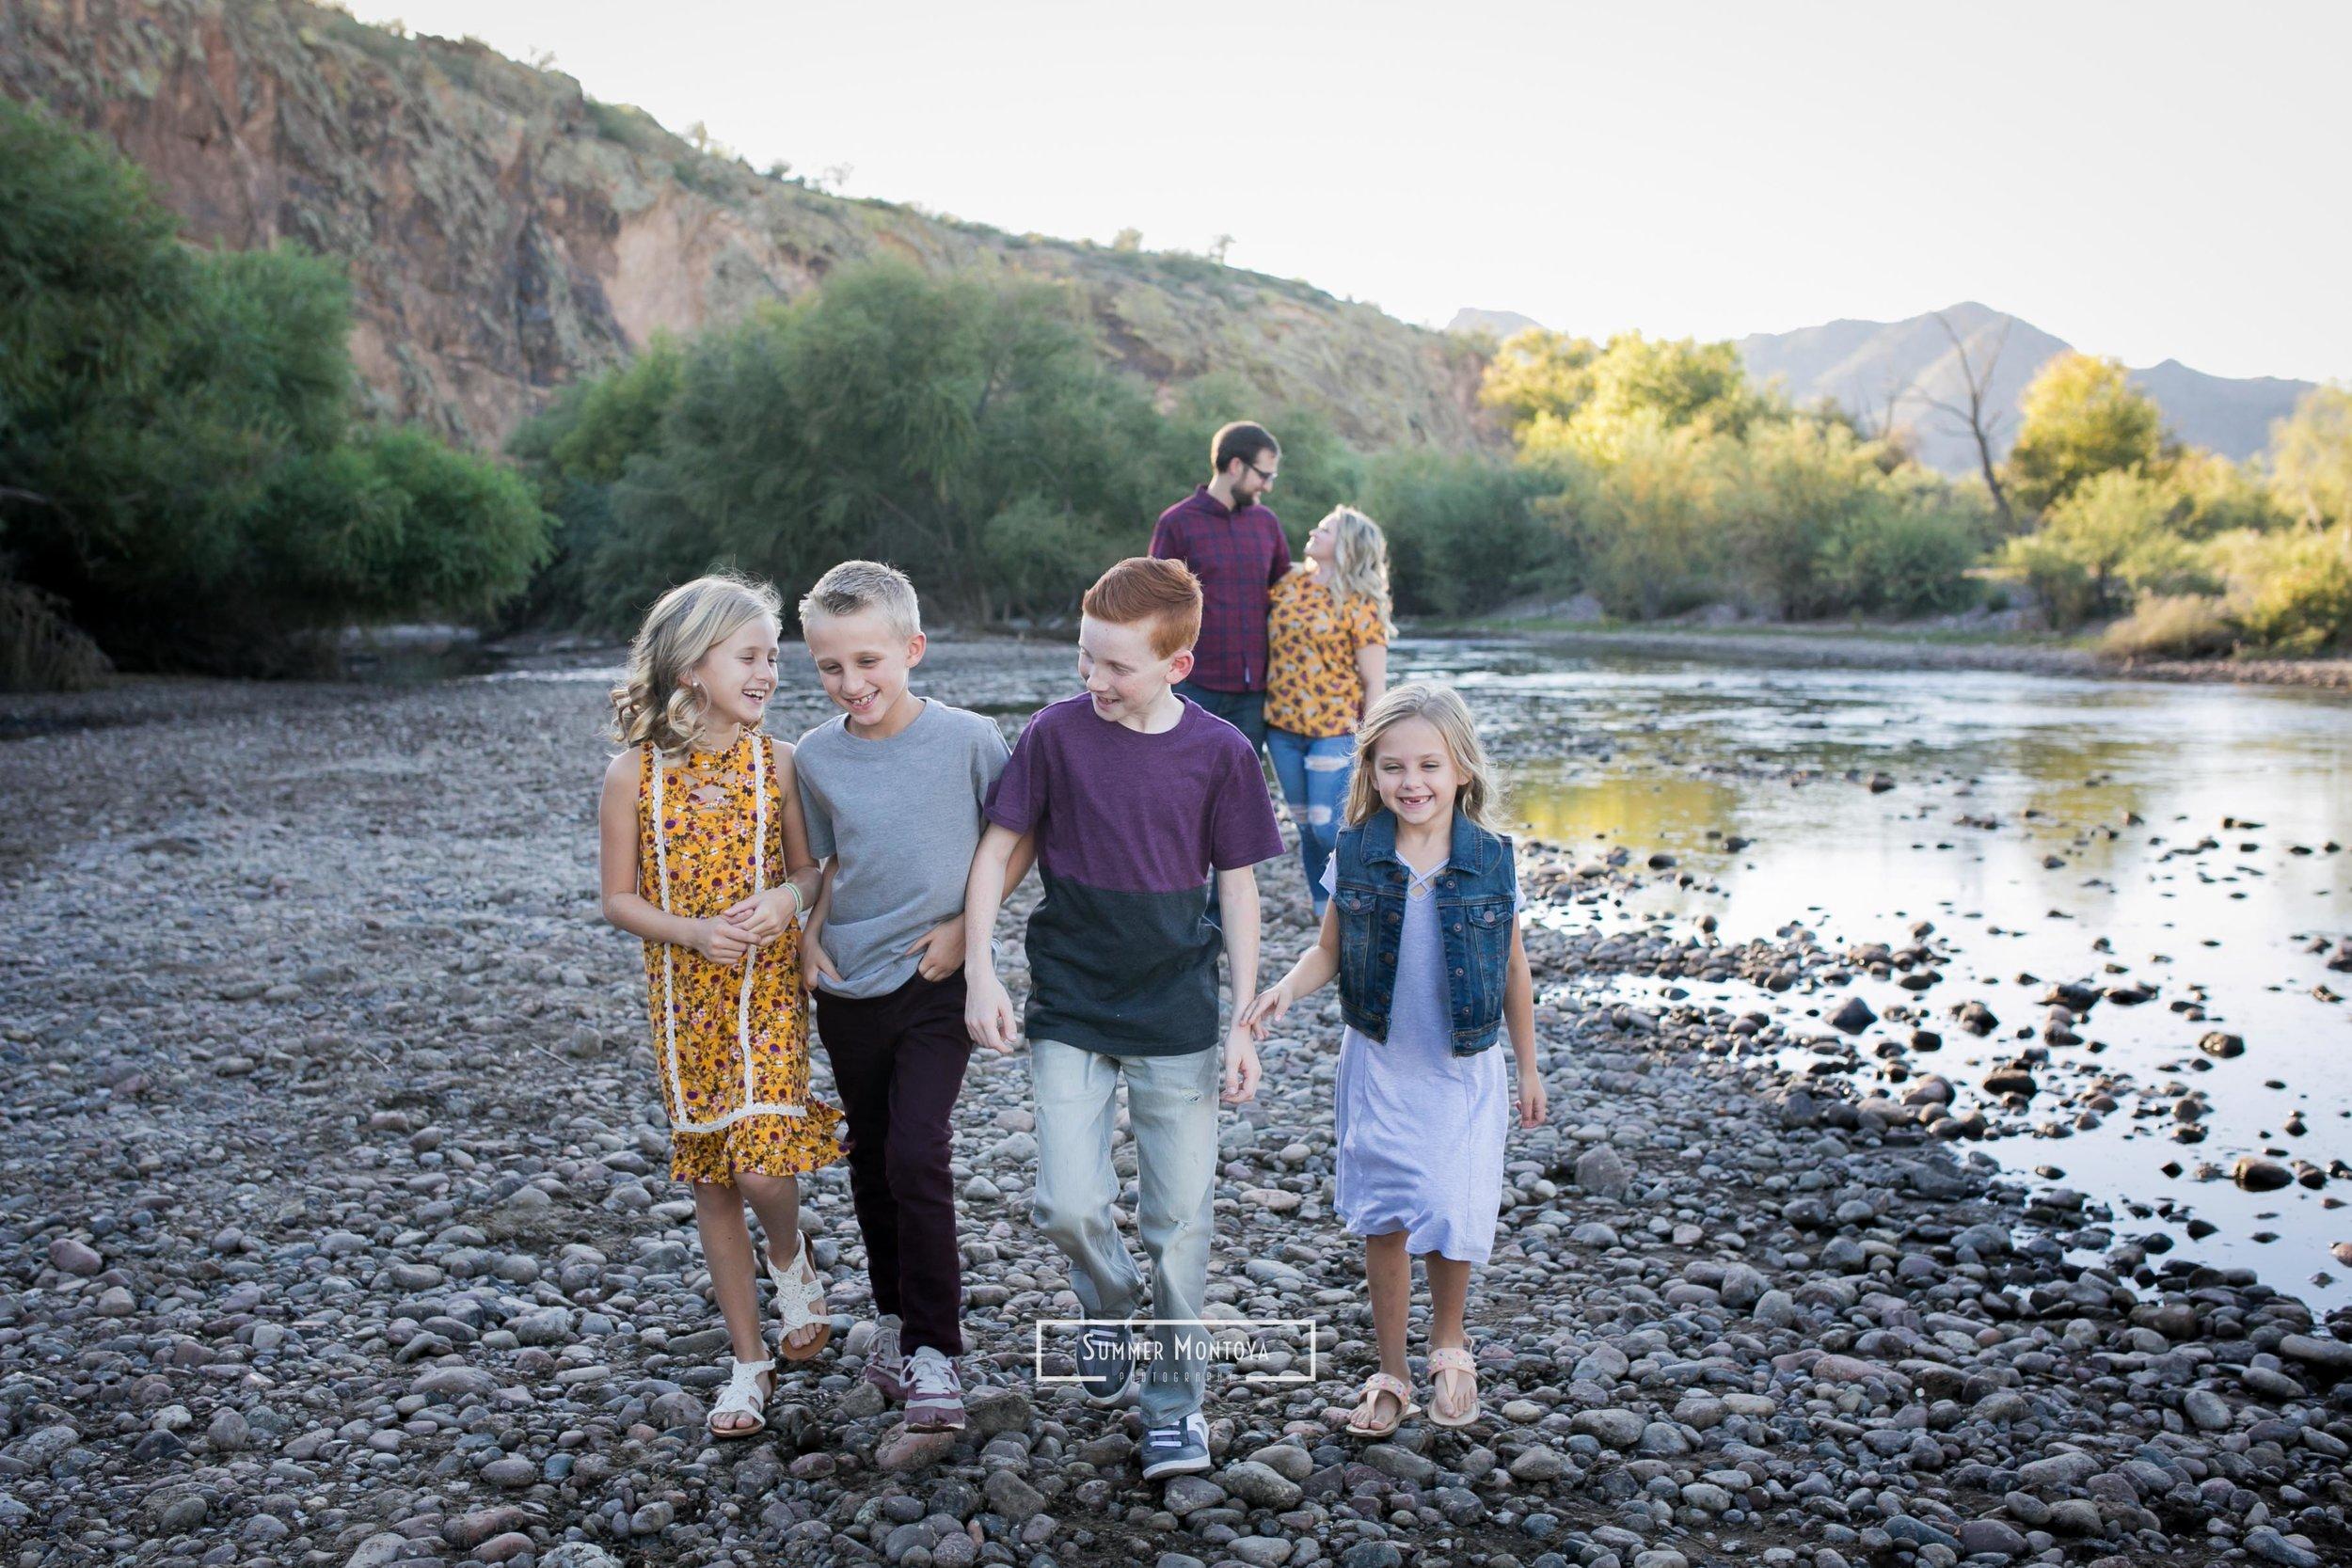 kids-walking-at-the-salt-river